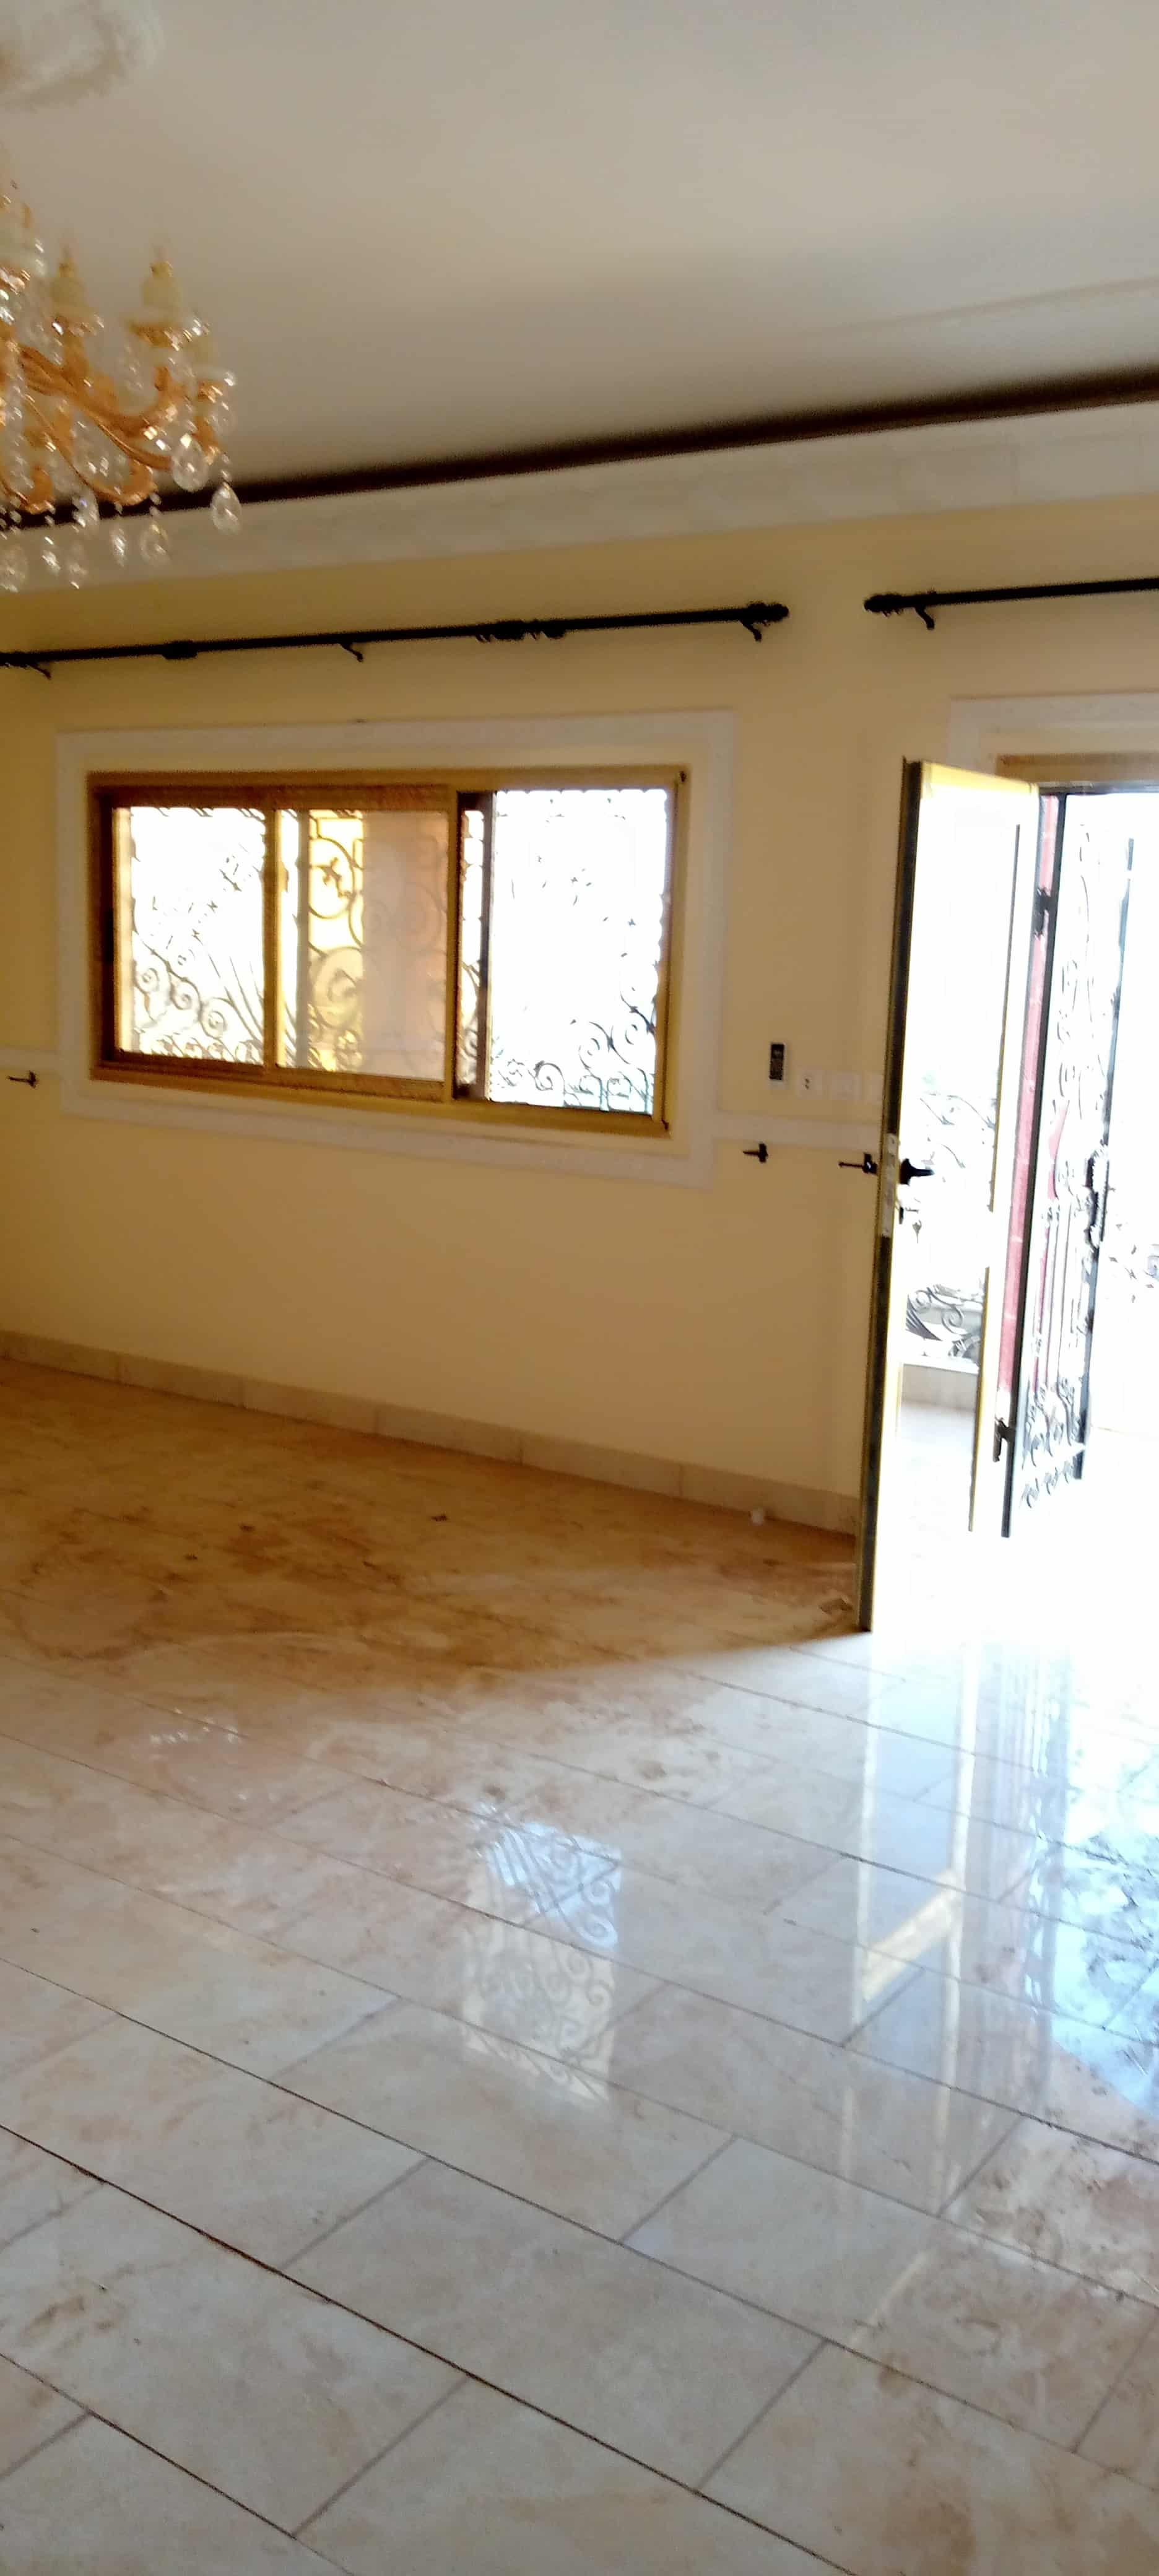 Apartment to rent - Yaoundé, Santa Barbara, Pas loin de gulfin - 1 living room(s), 3 bedroom(s), 4 bathroom(s) - 300 000 FCFA / month